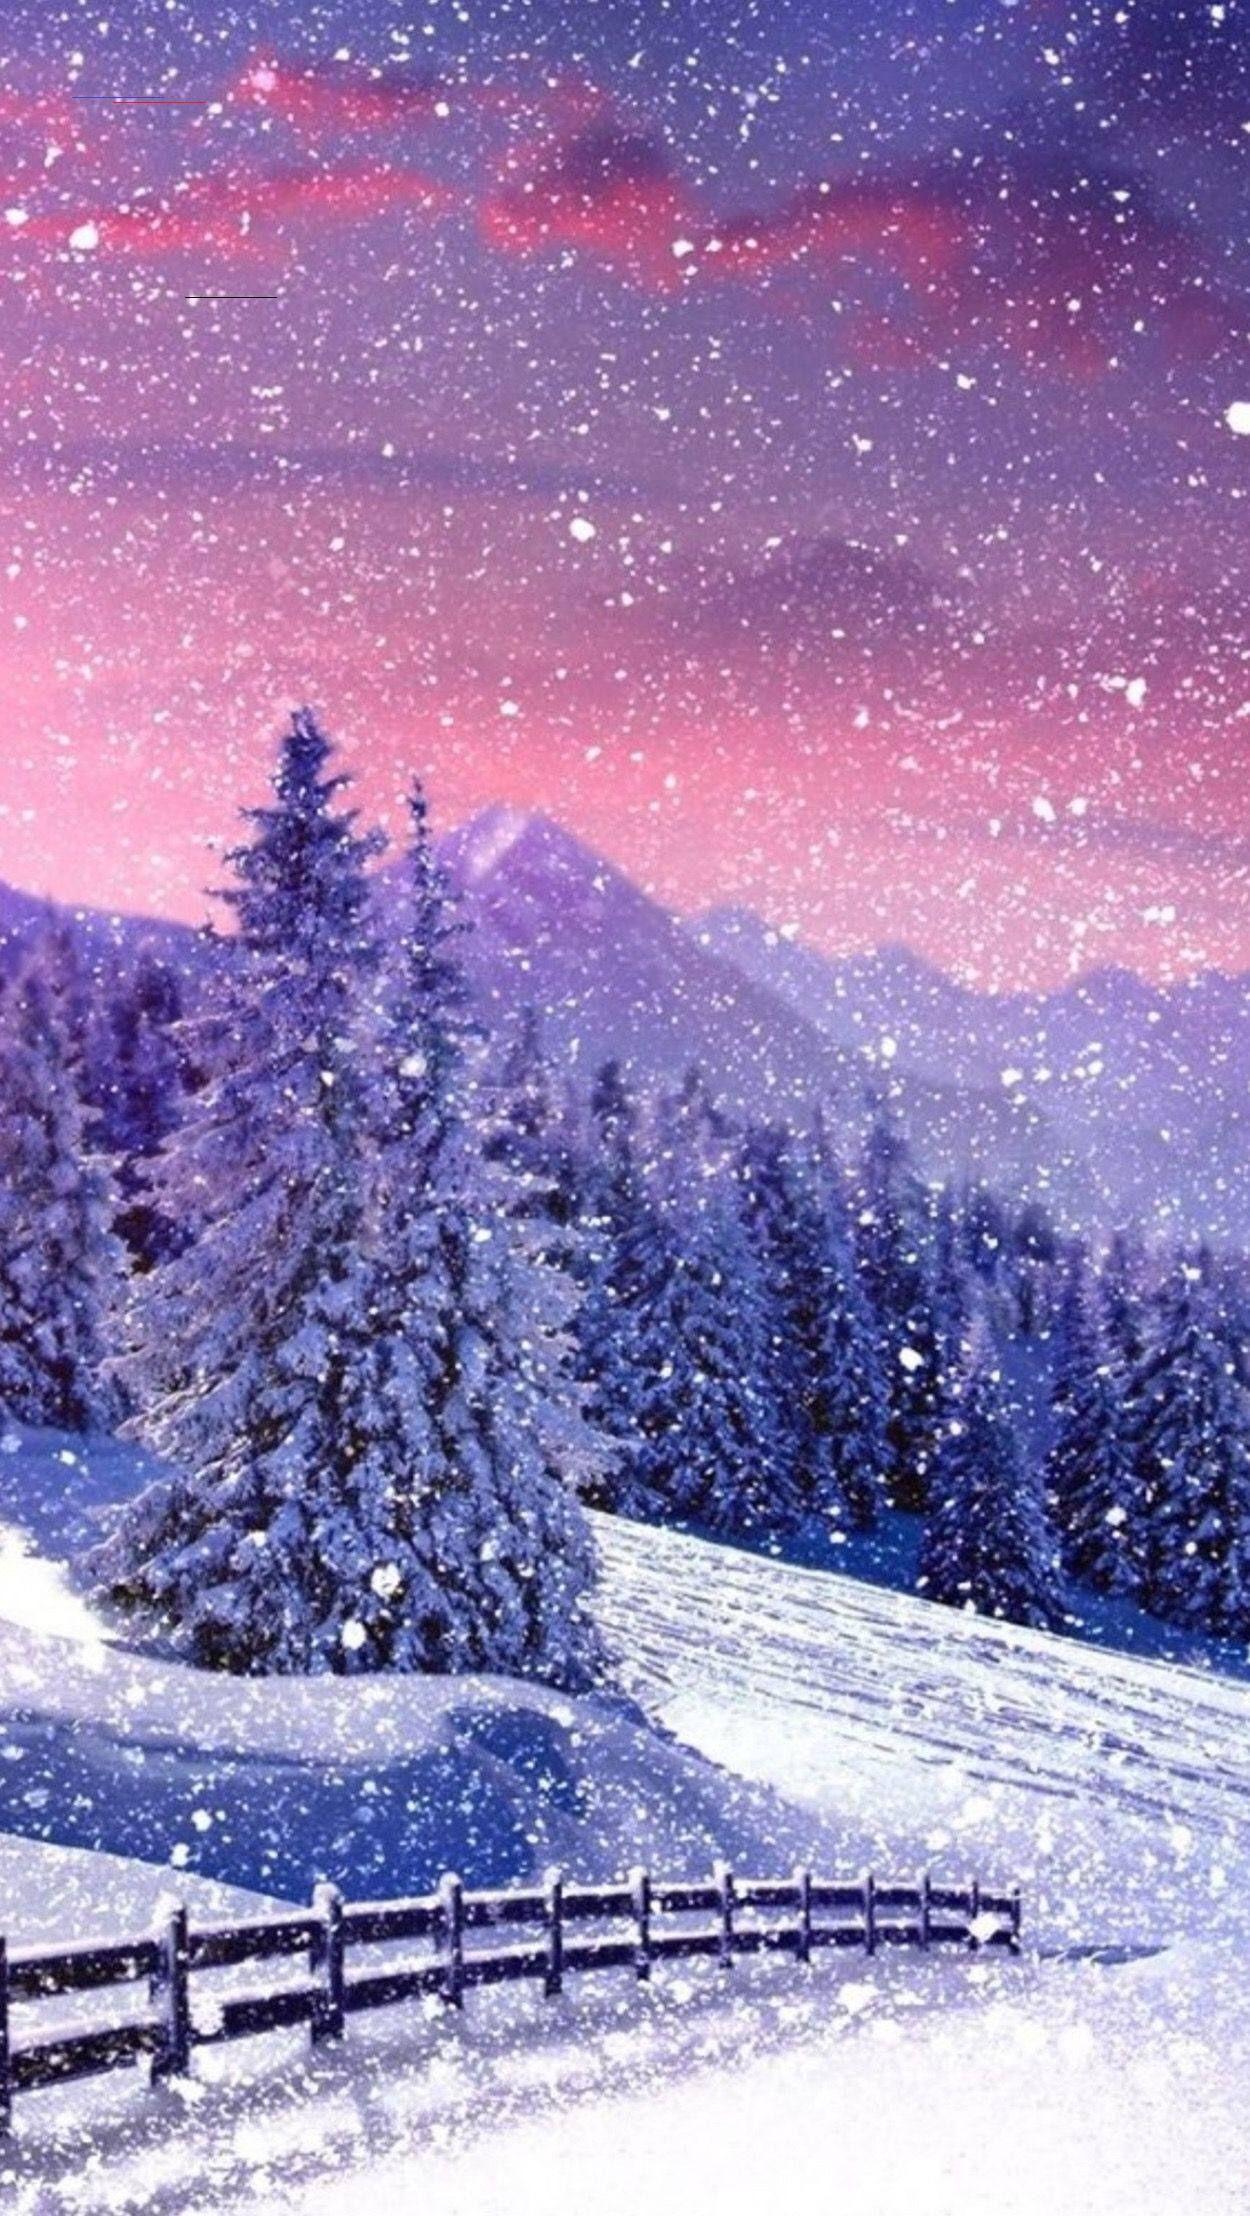 Winterbackground Winter Wallpaper Winter Background Wallpaper Iphone Christmas